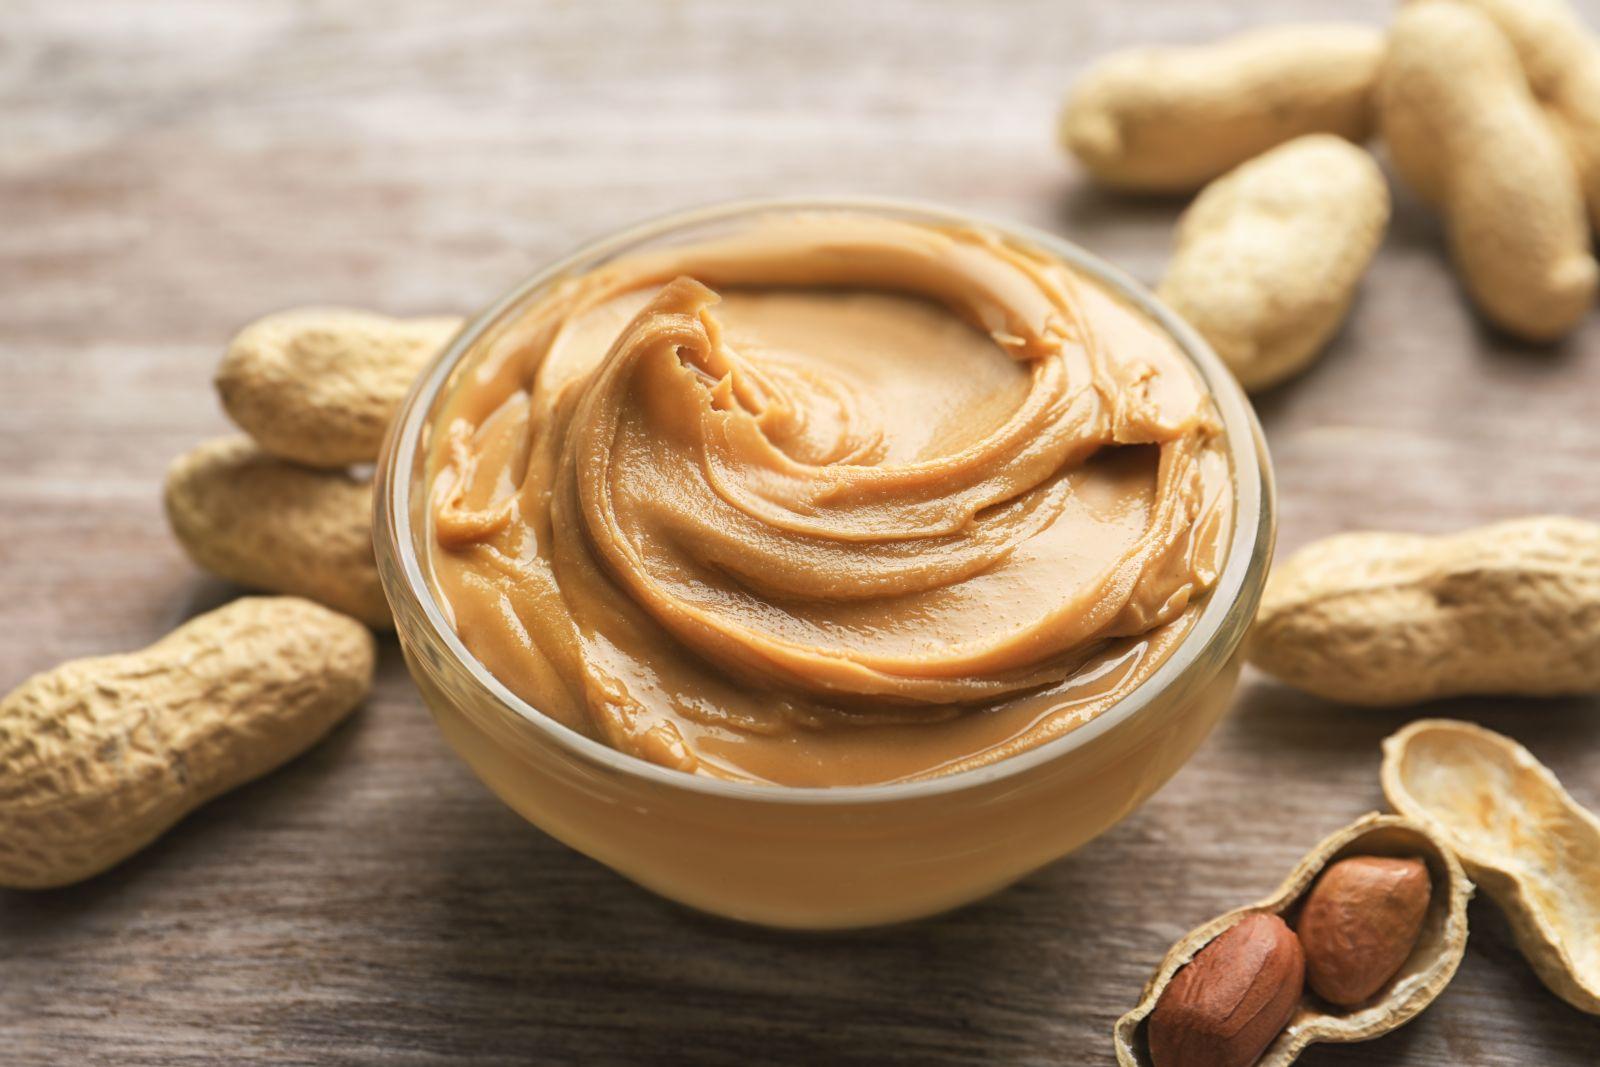 Peanut butter-340gms